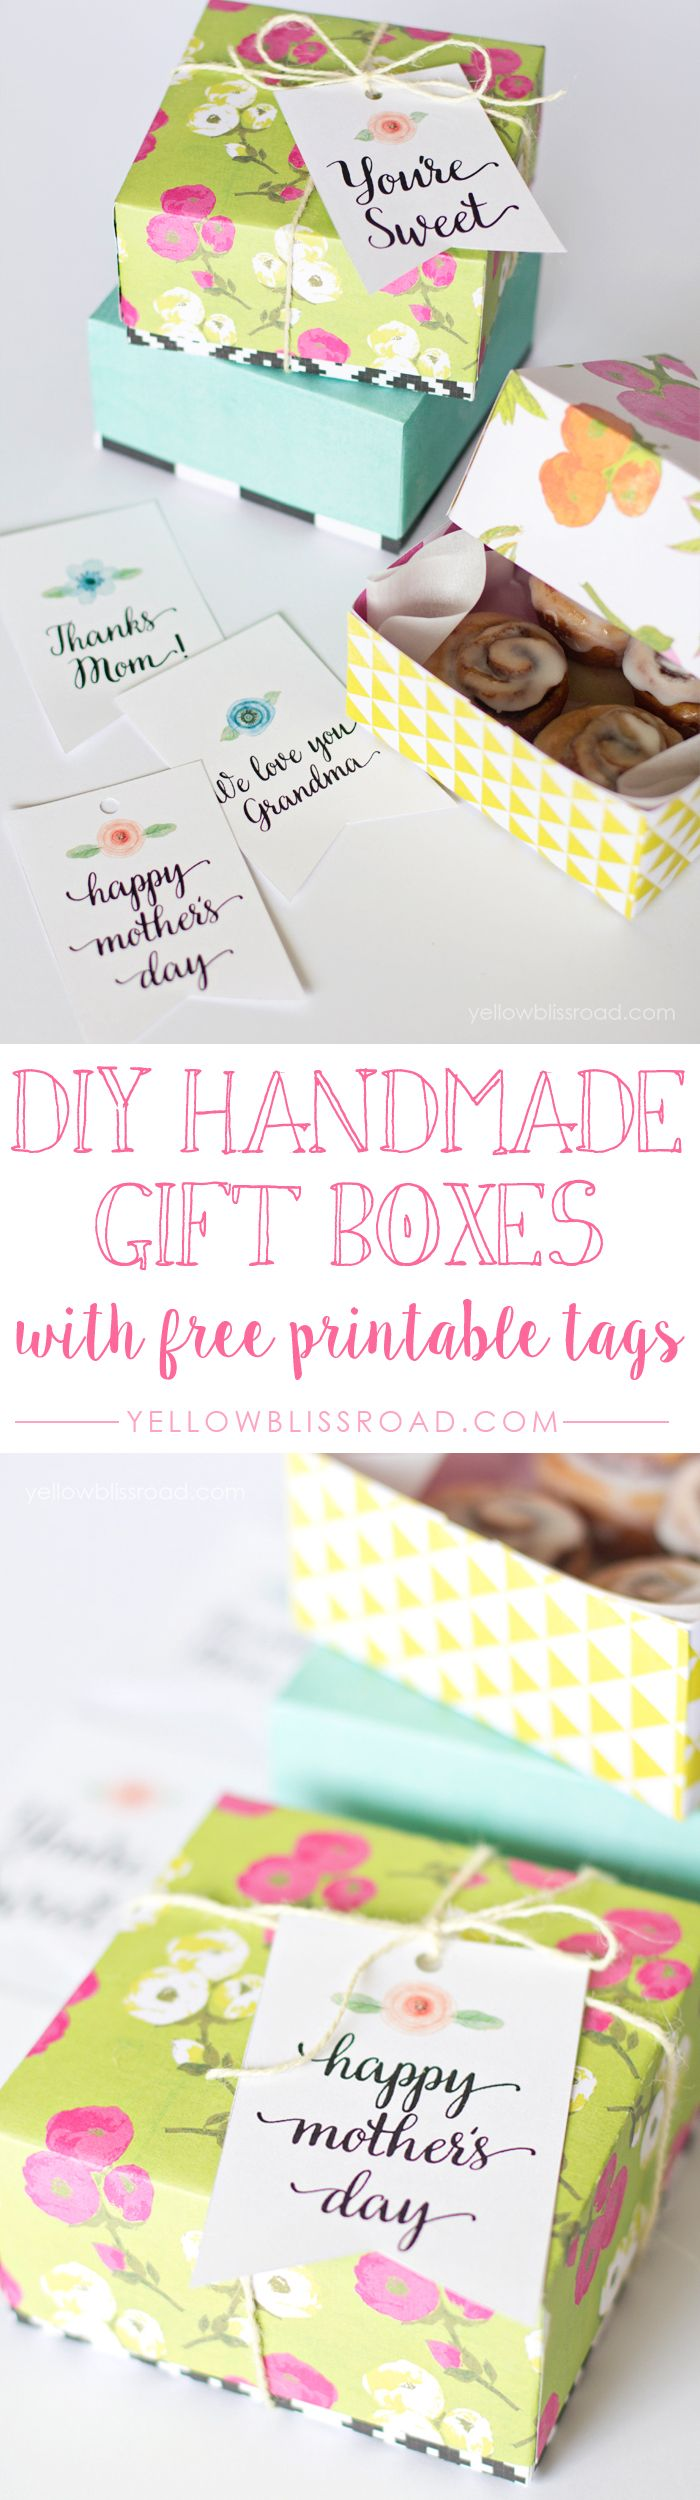 DIY Handmade Gift Boxes with Free Printable Gift Tags